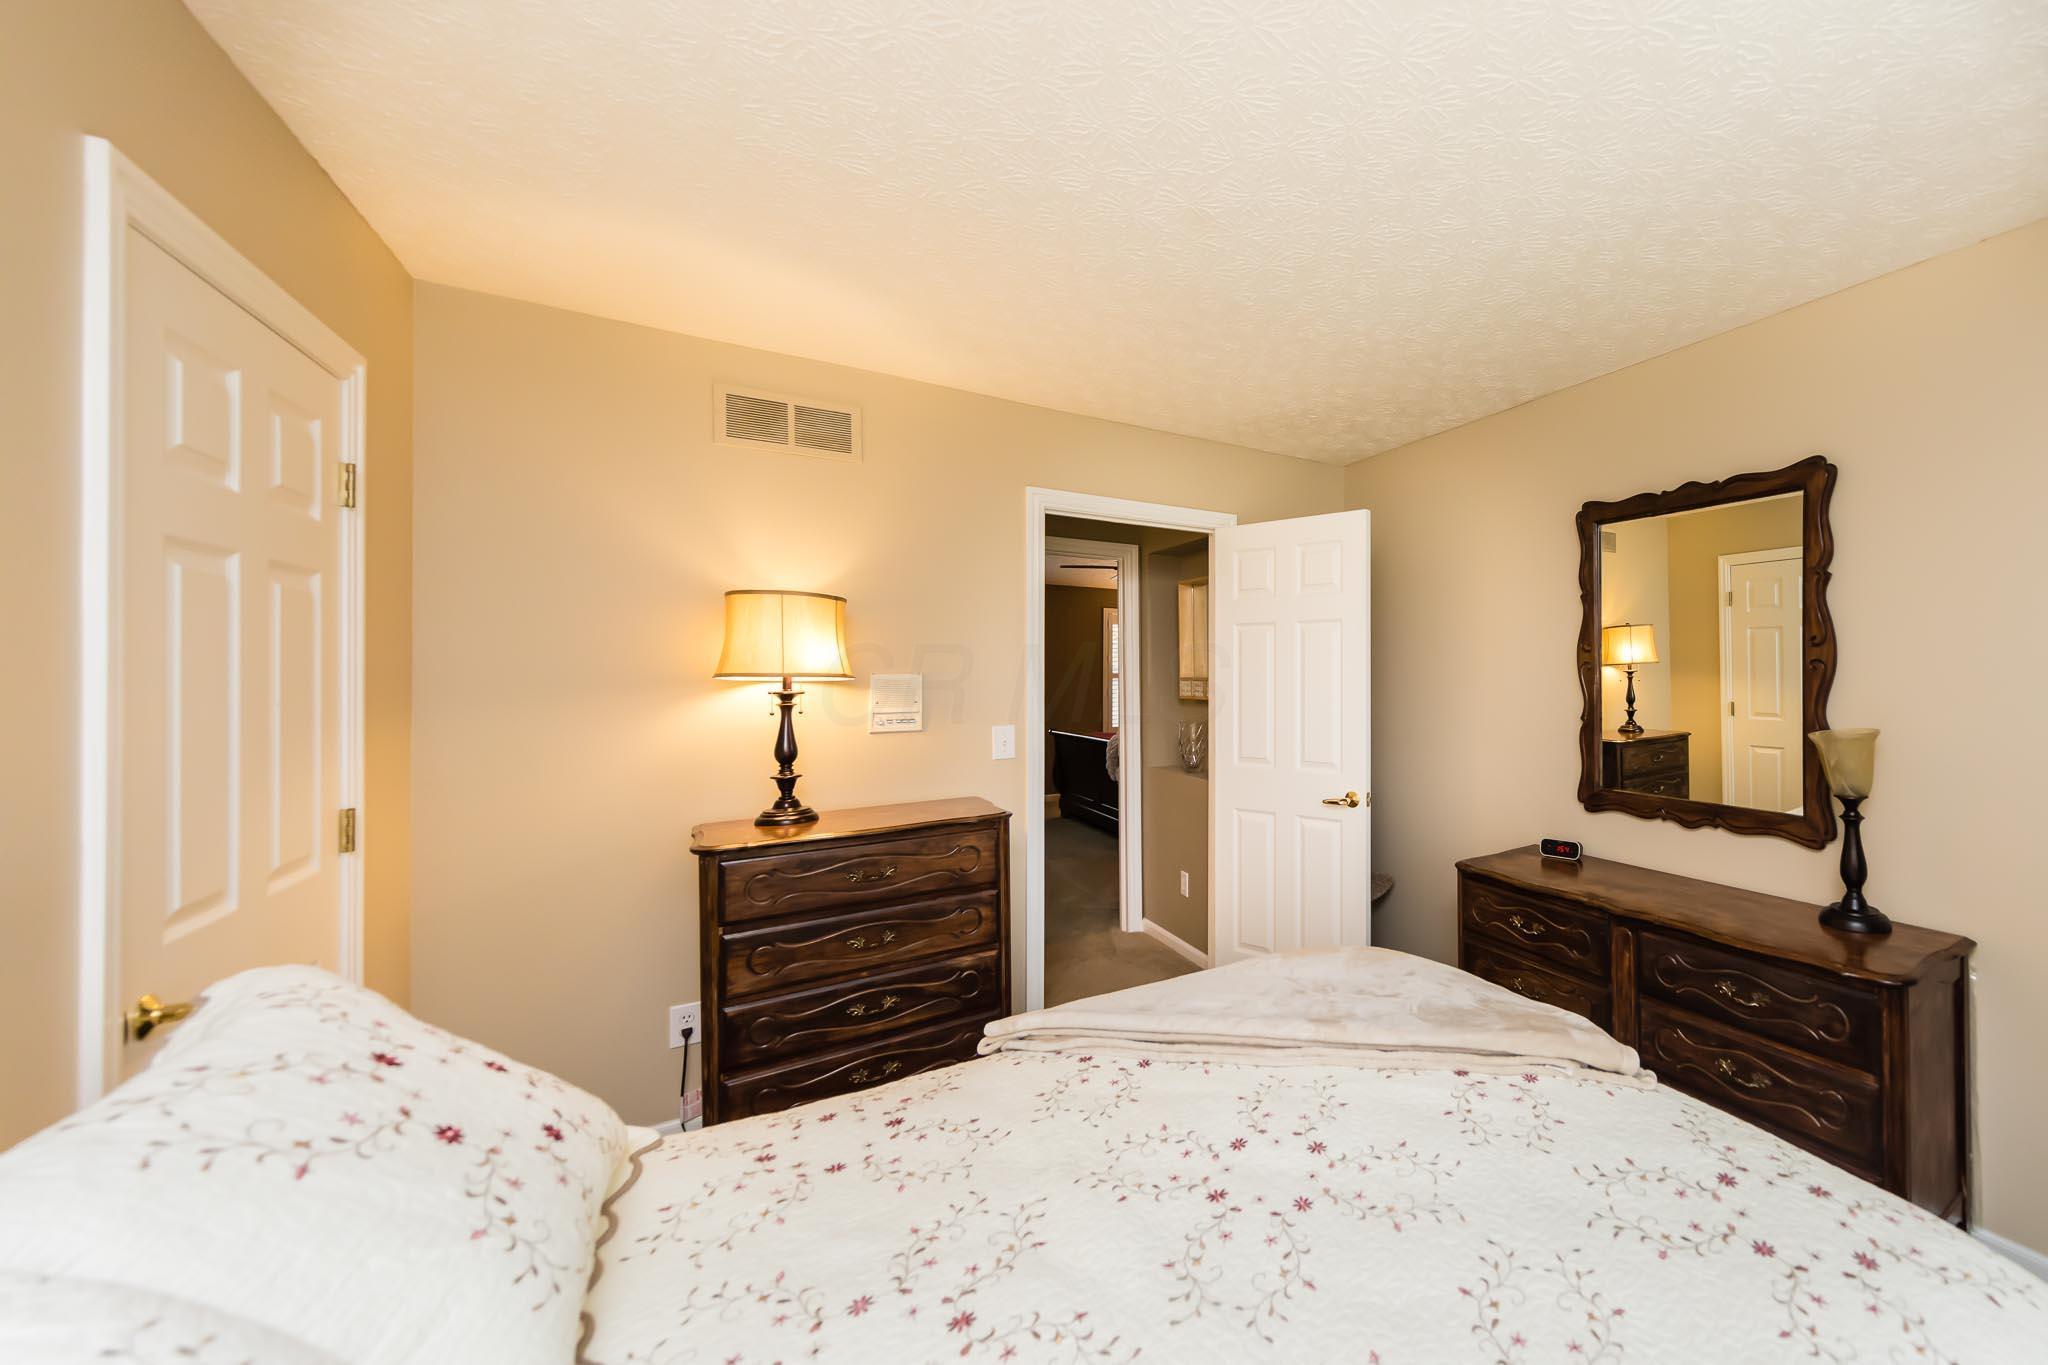 6218 Wynford Drive, Dublin, Ohio 43016, 4 Bedrooms Bedrooms, ,3 BathroomsBathrooms,Residential,For Sale,Wynford,220040686